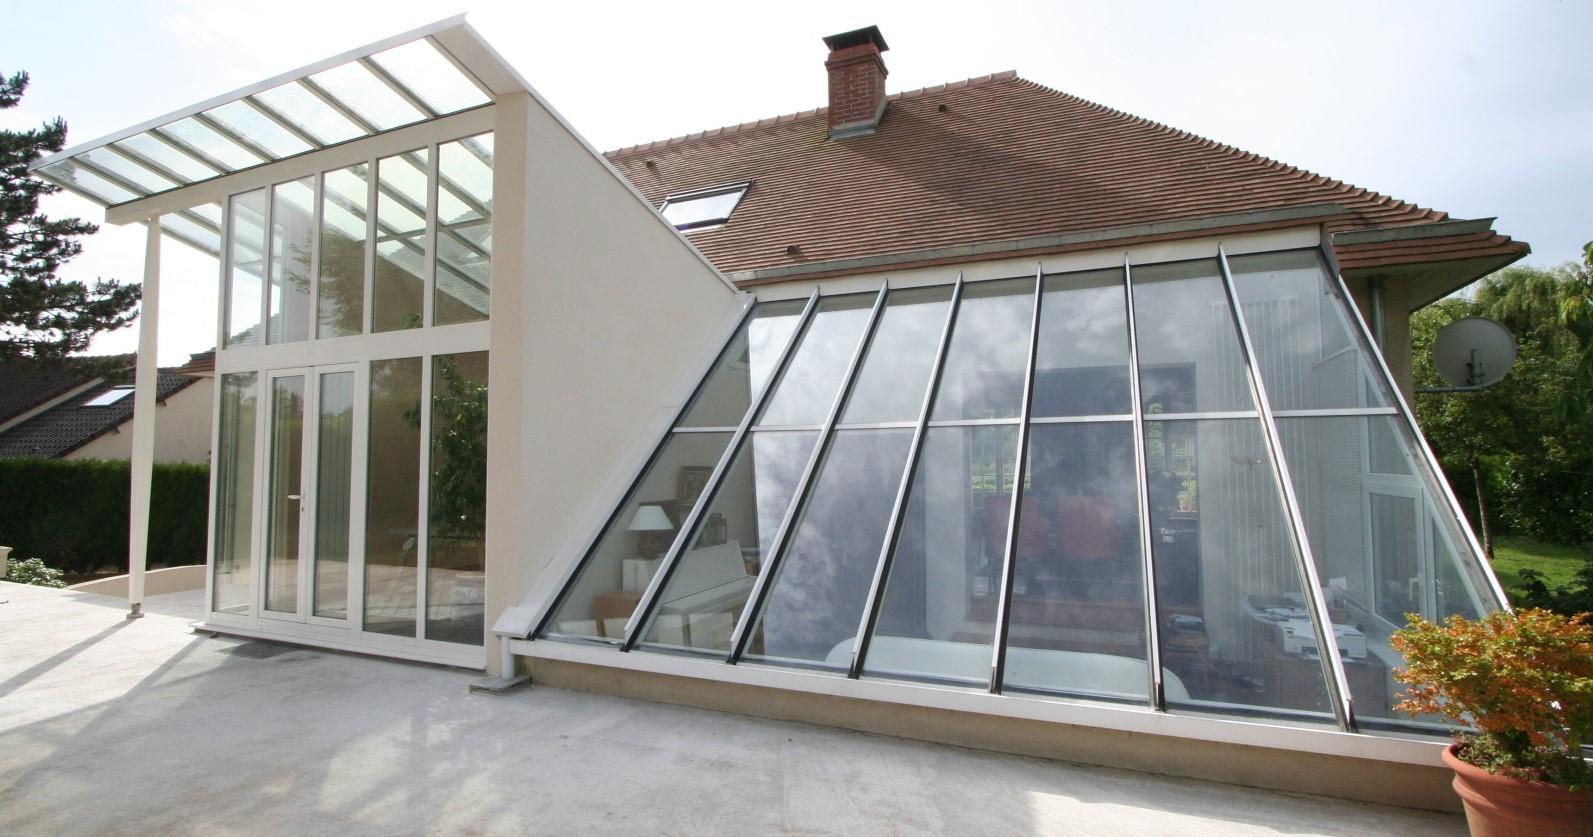 Véranda architecturale - Slider Komilfo